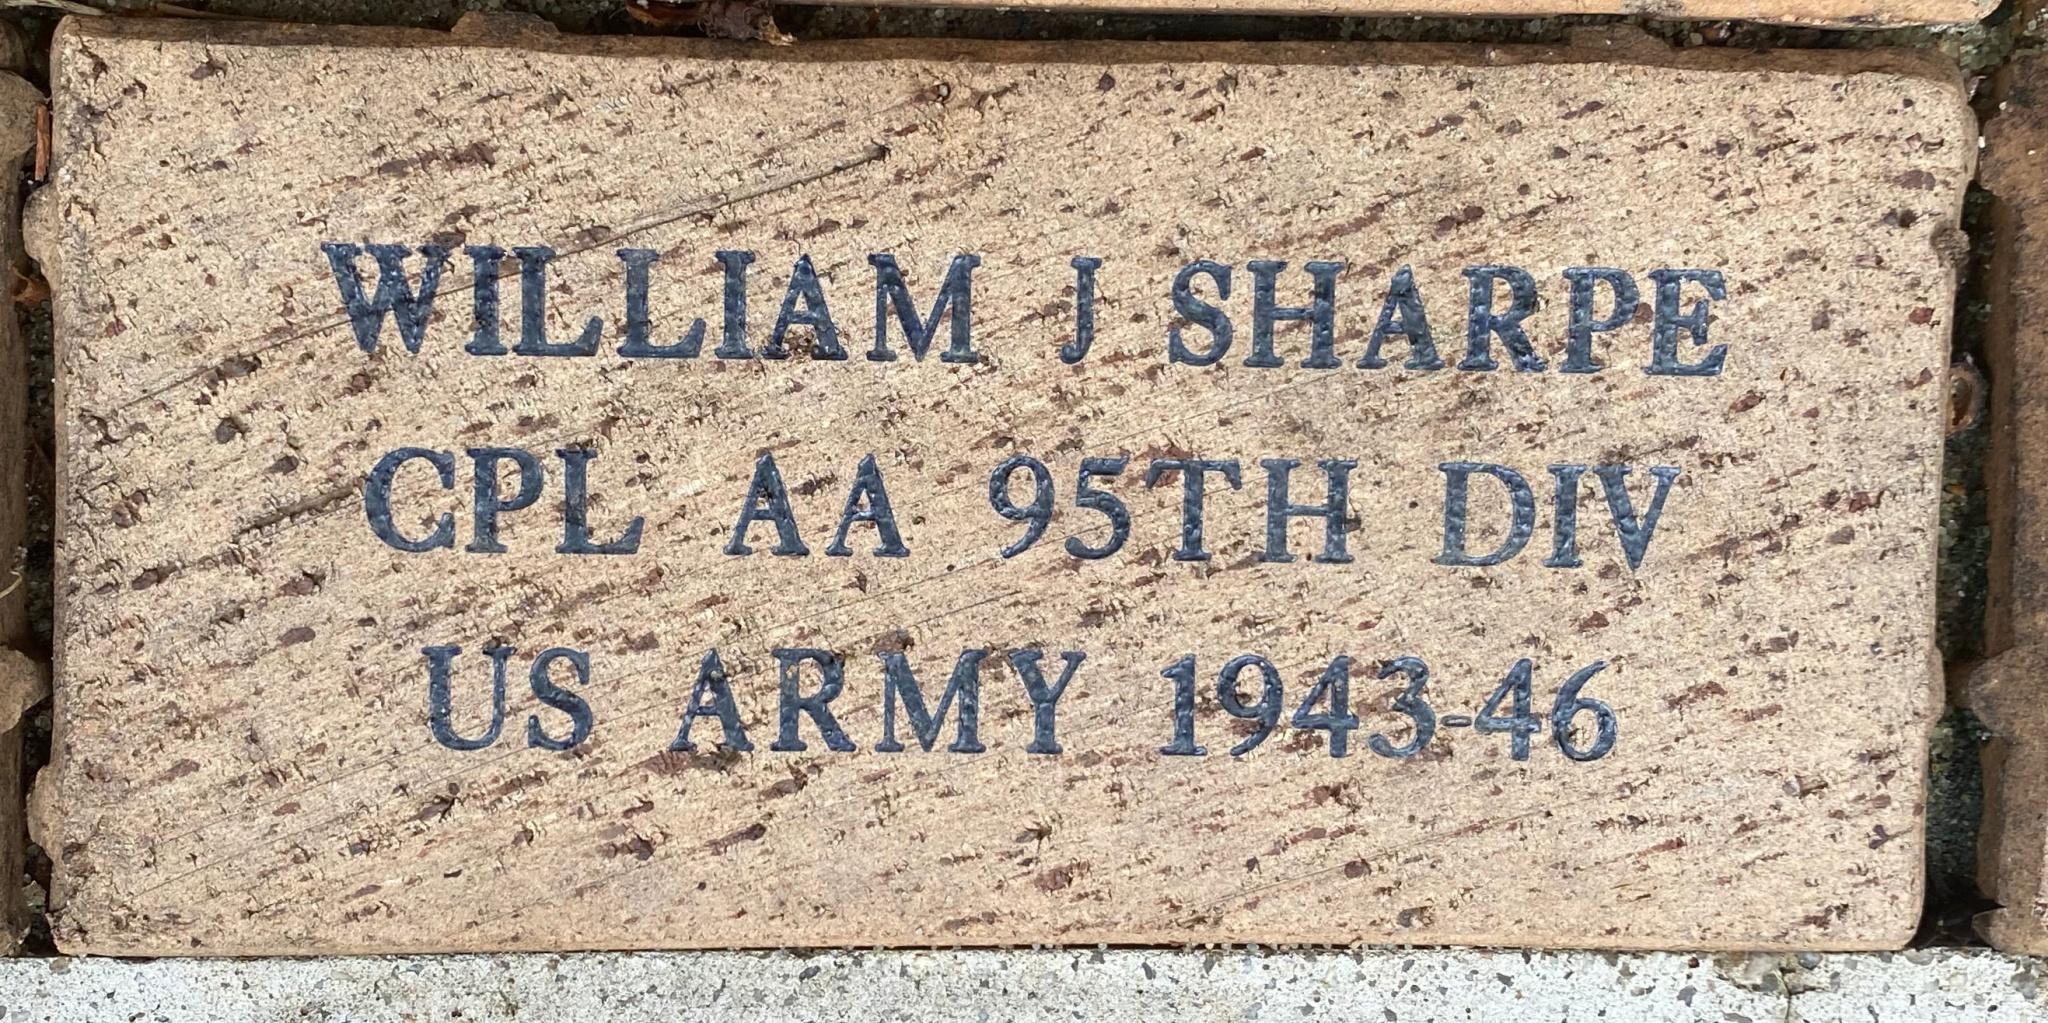 WILLIAM J SHARPE CPL AA 95TH DIV US ARMY 1943-46